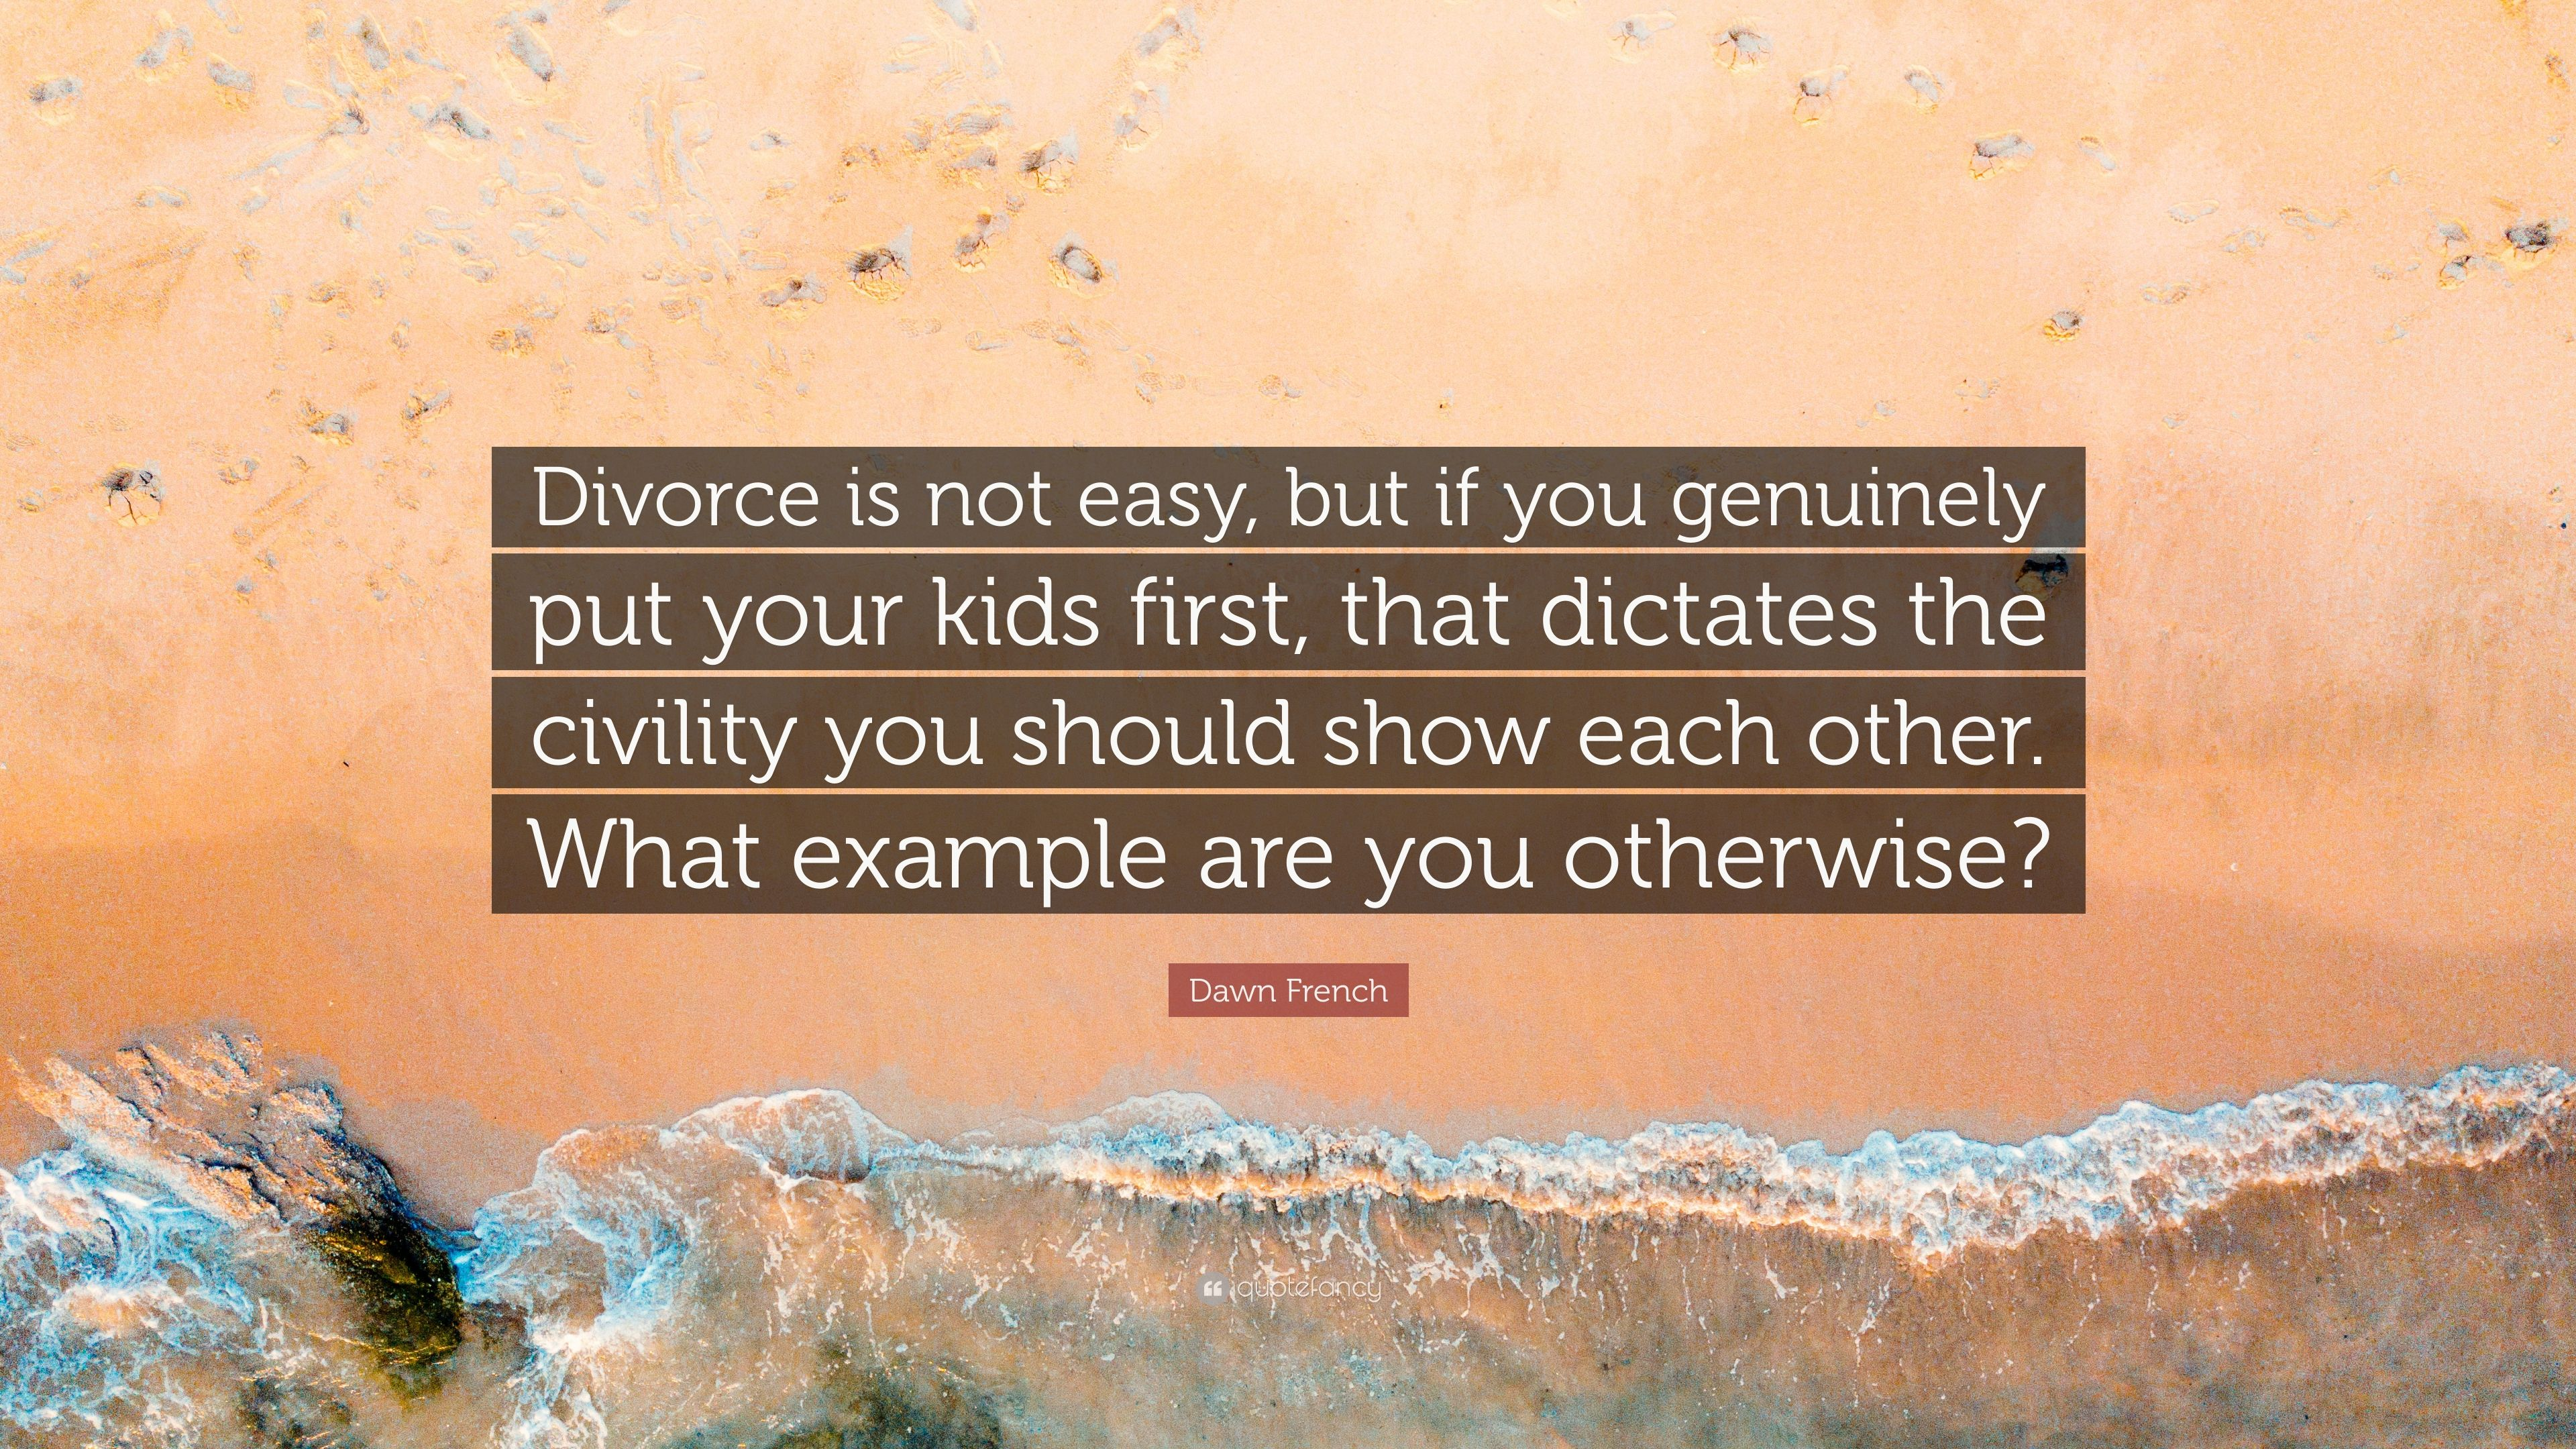 Divorce Quotes 100  Encouragement Quotes Divorce   102 Marriage And Love